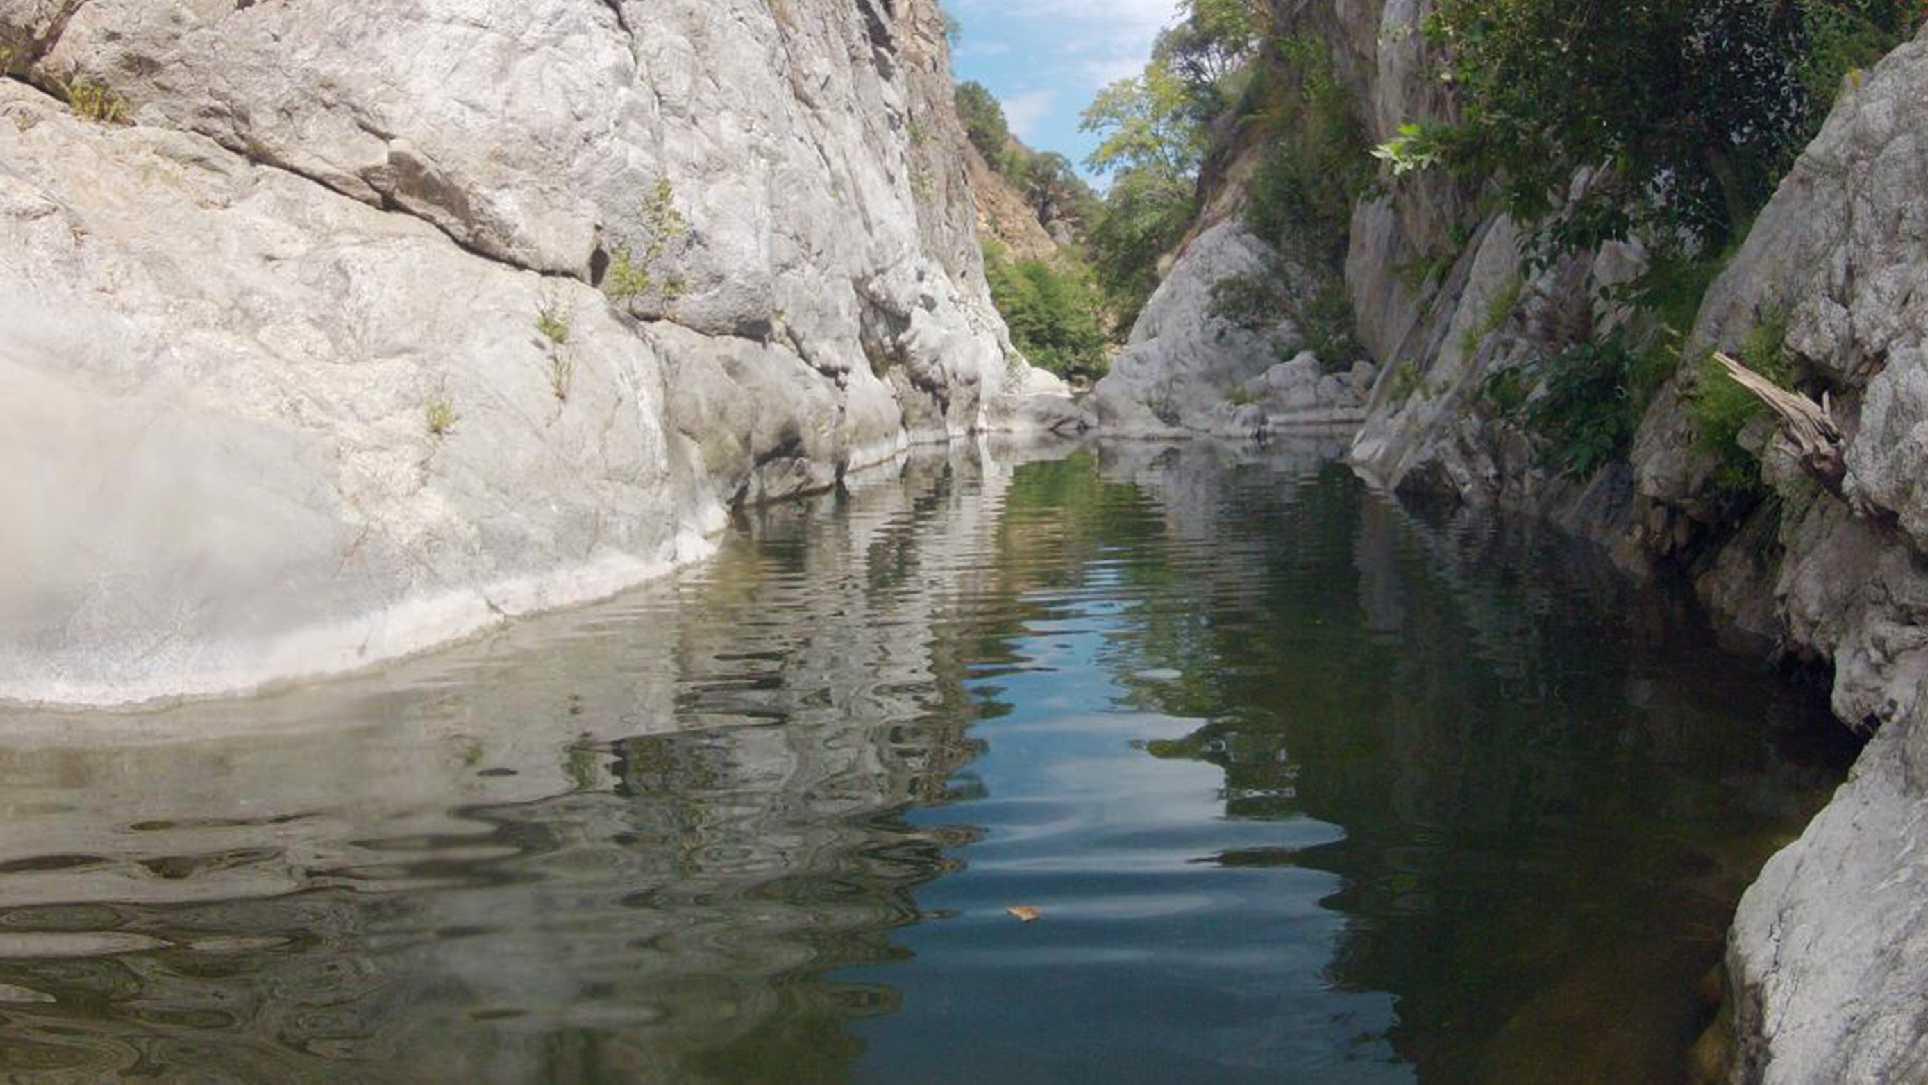 Arroyo Seco river